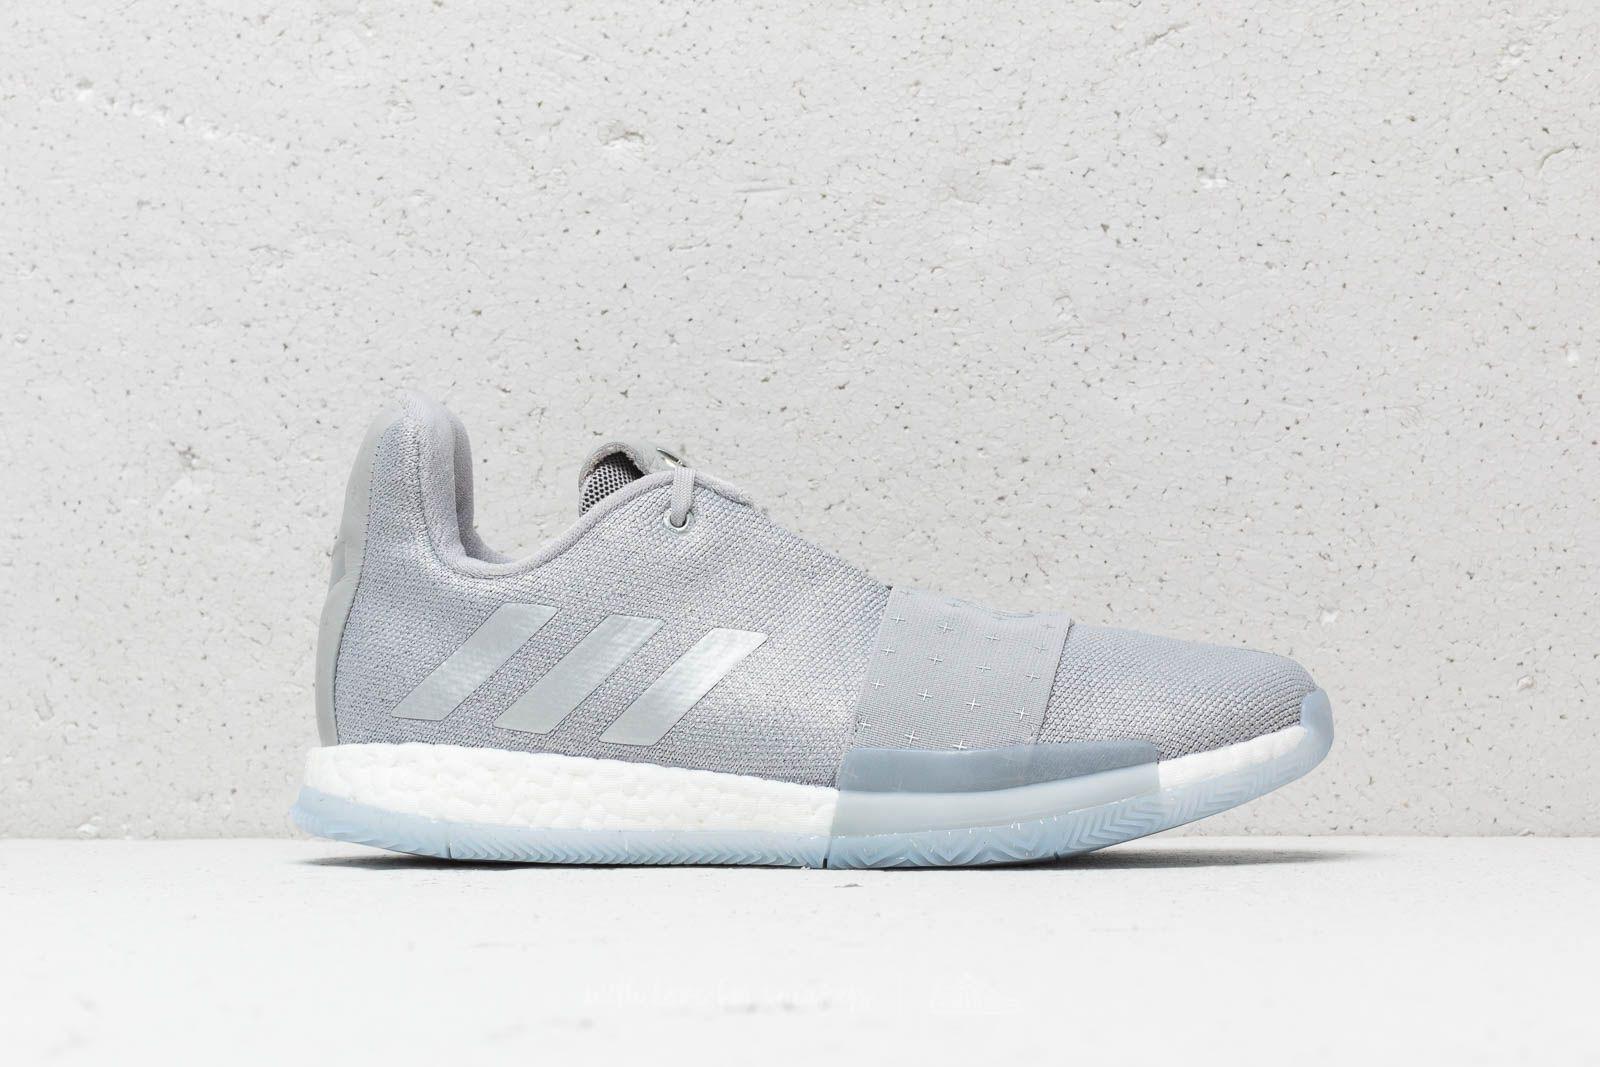 new styles bbd57 34955 adidas Originals Adidas Harden Vol. 3 Grey Two  Silver Metallic ...